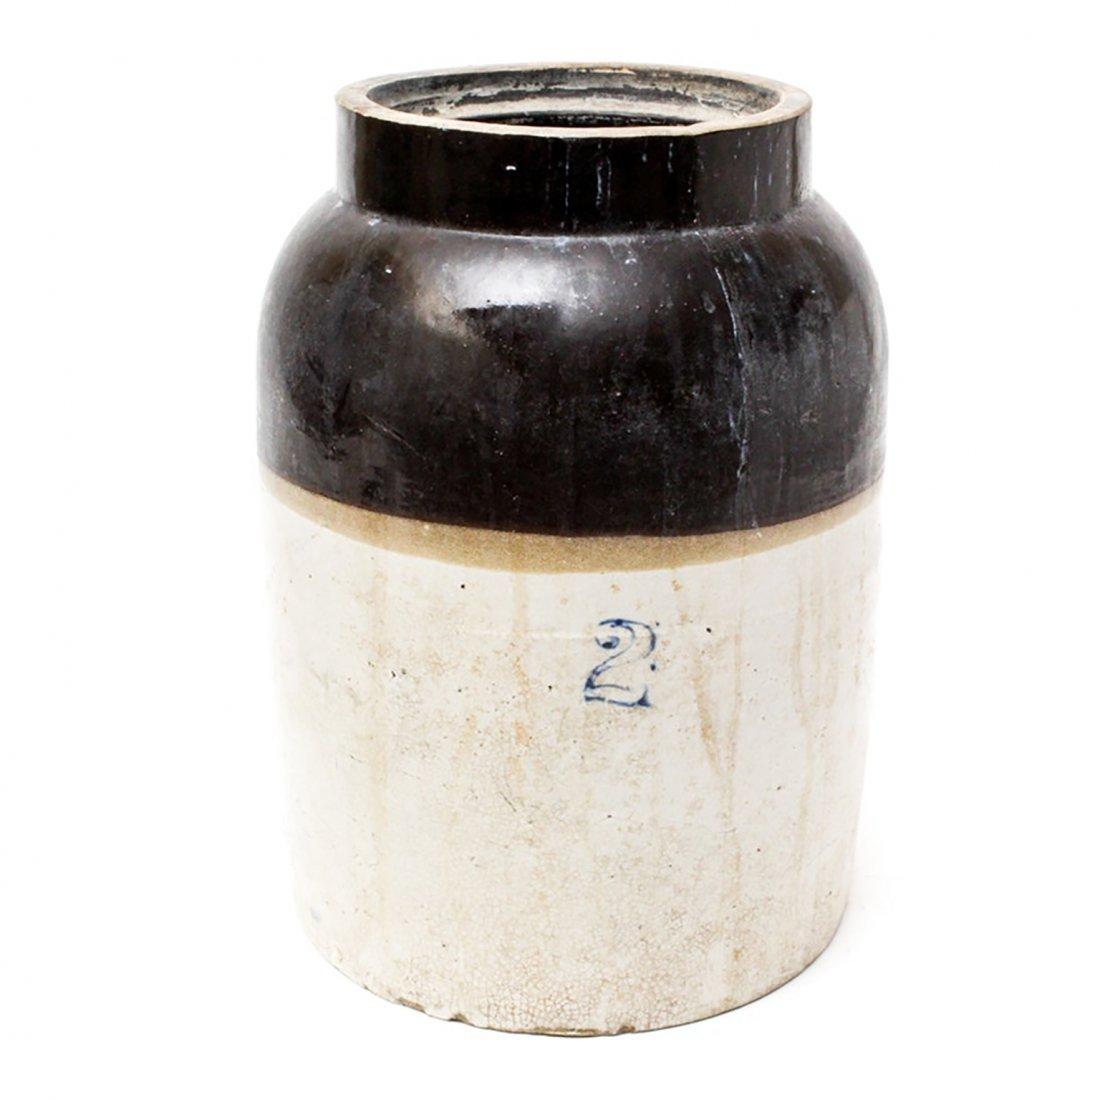 Vintage Two Gallon Stoneware Crock